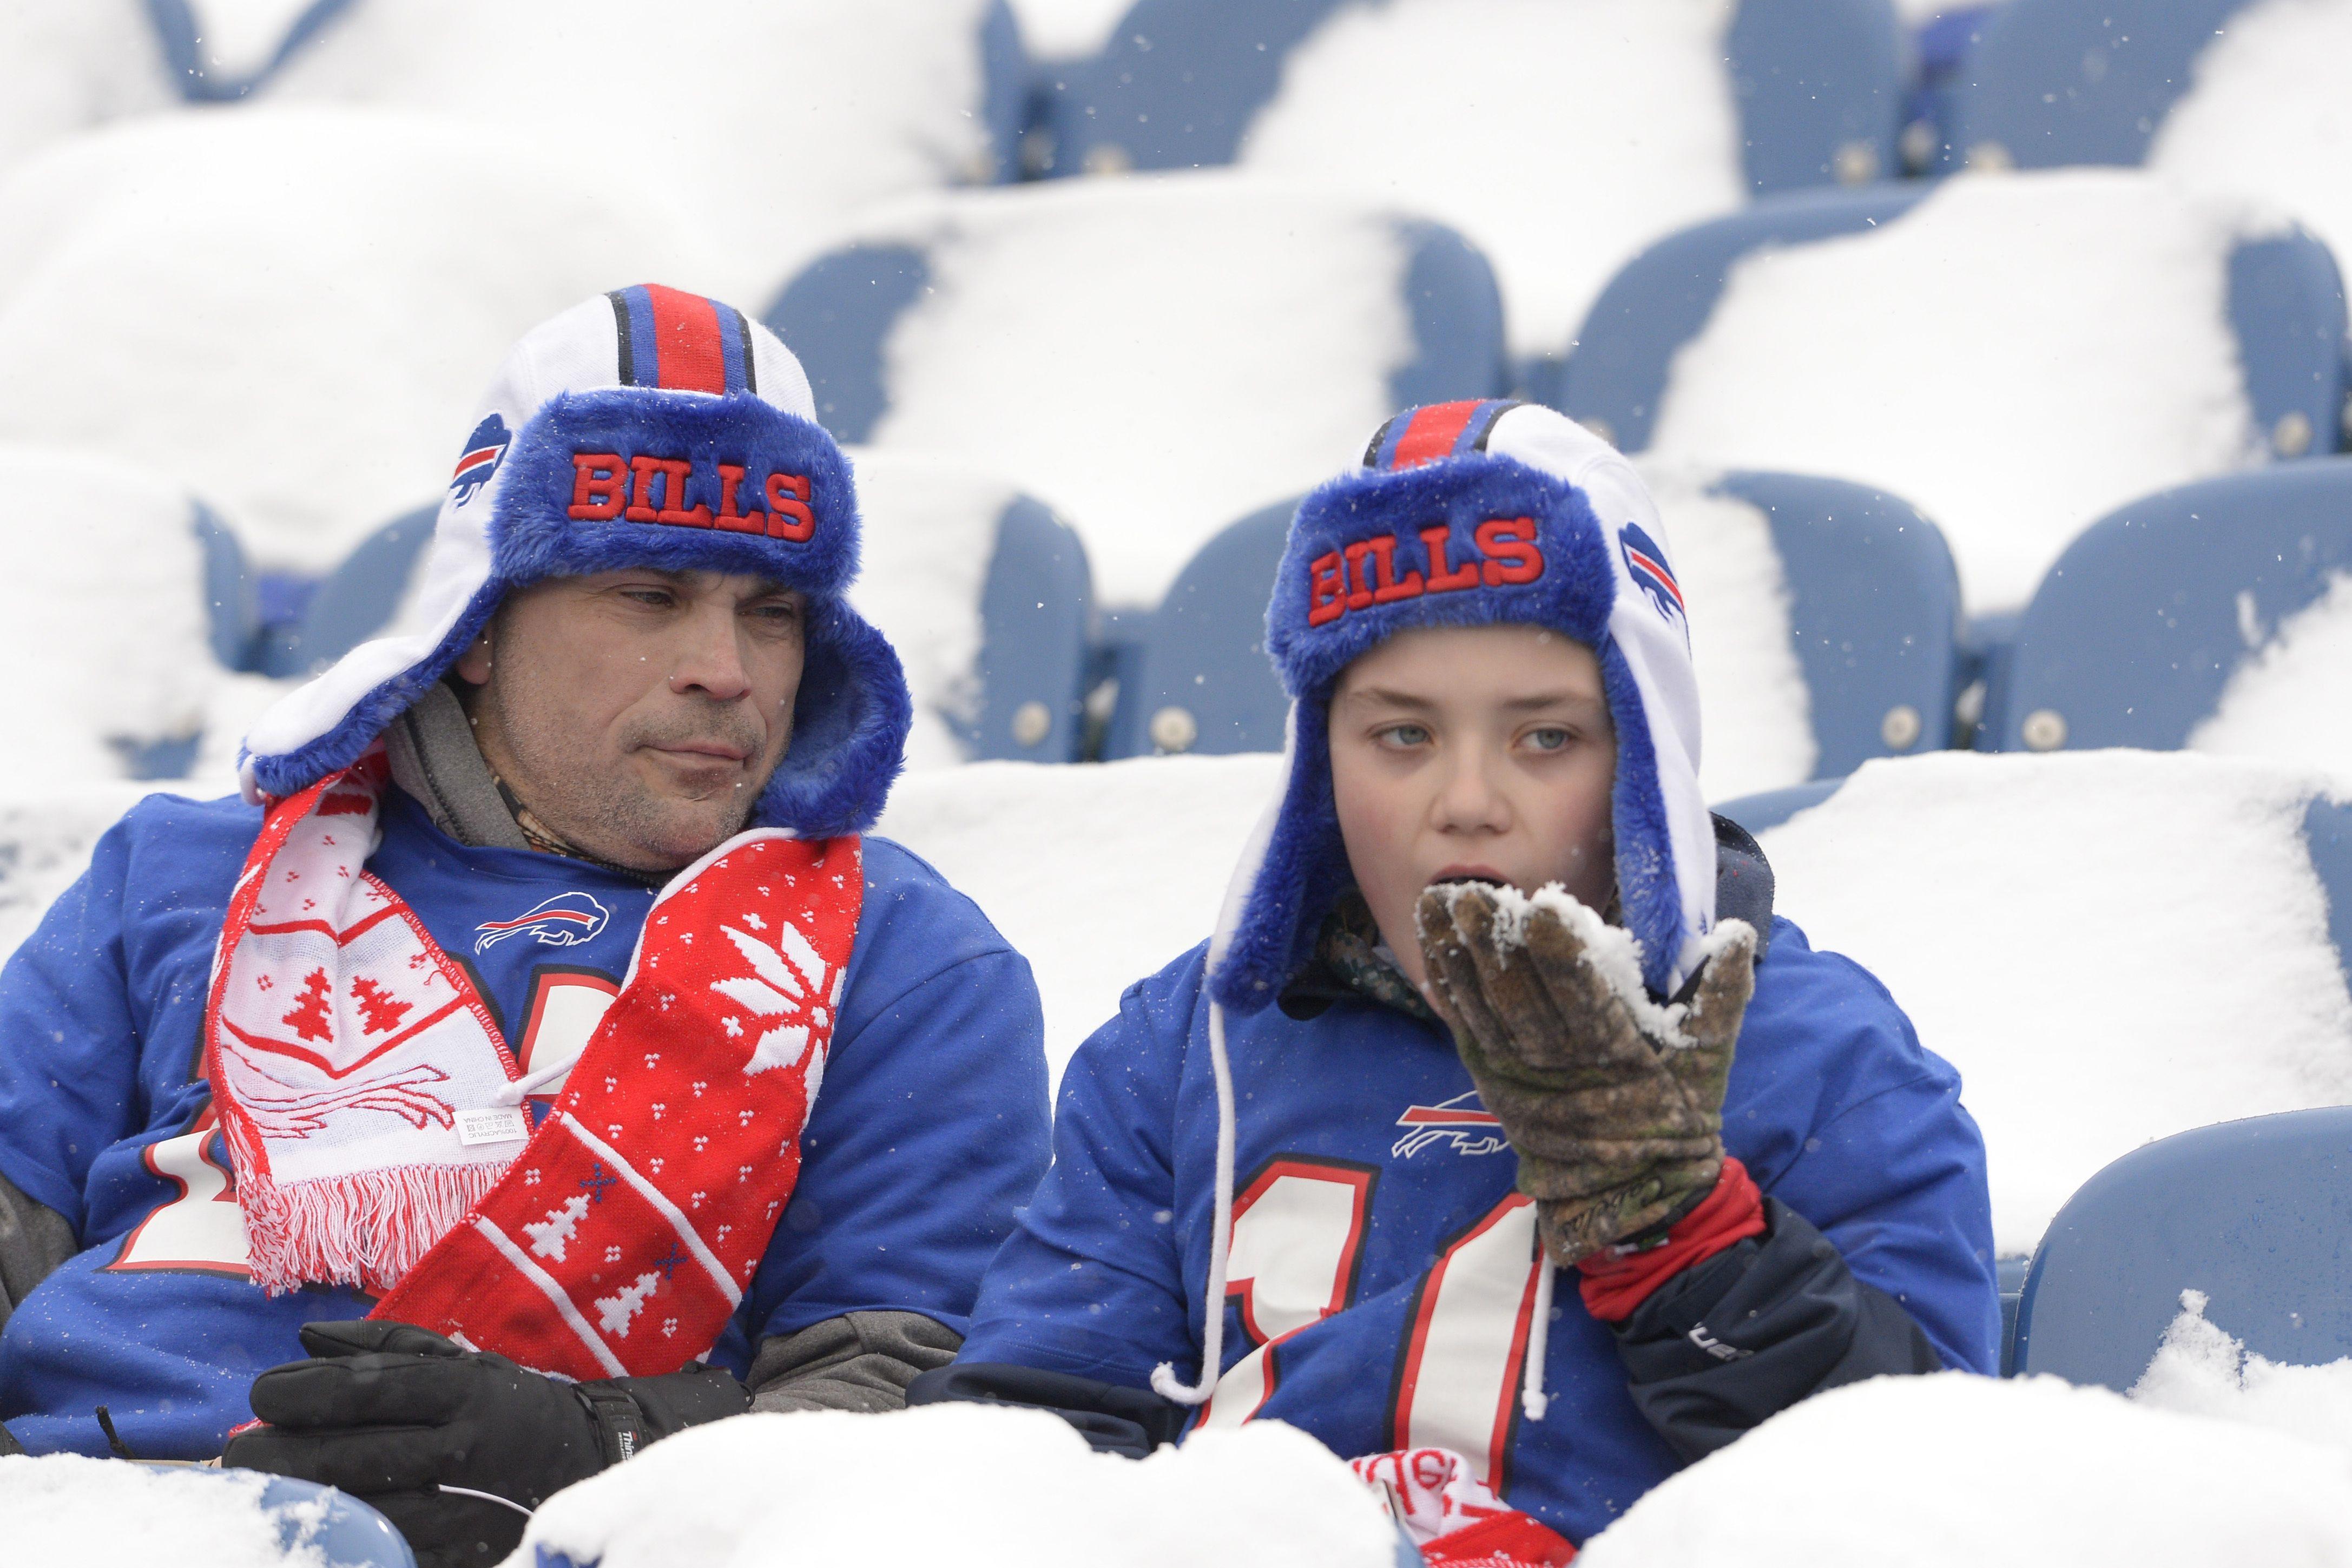 Snow Ain T No Thing For A Bills Fan In Week 14 Ap Kraus Nfl Football Games New York Giants Buffalo Bills